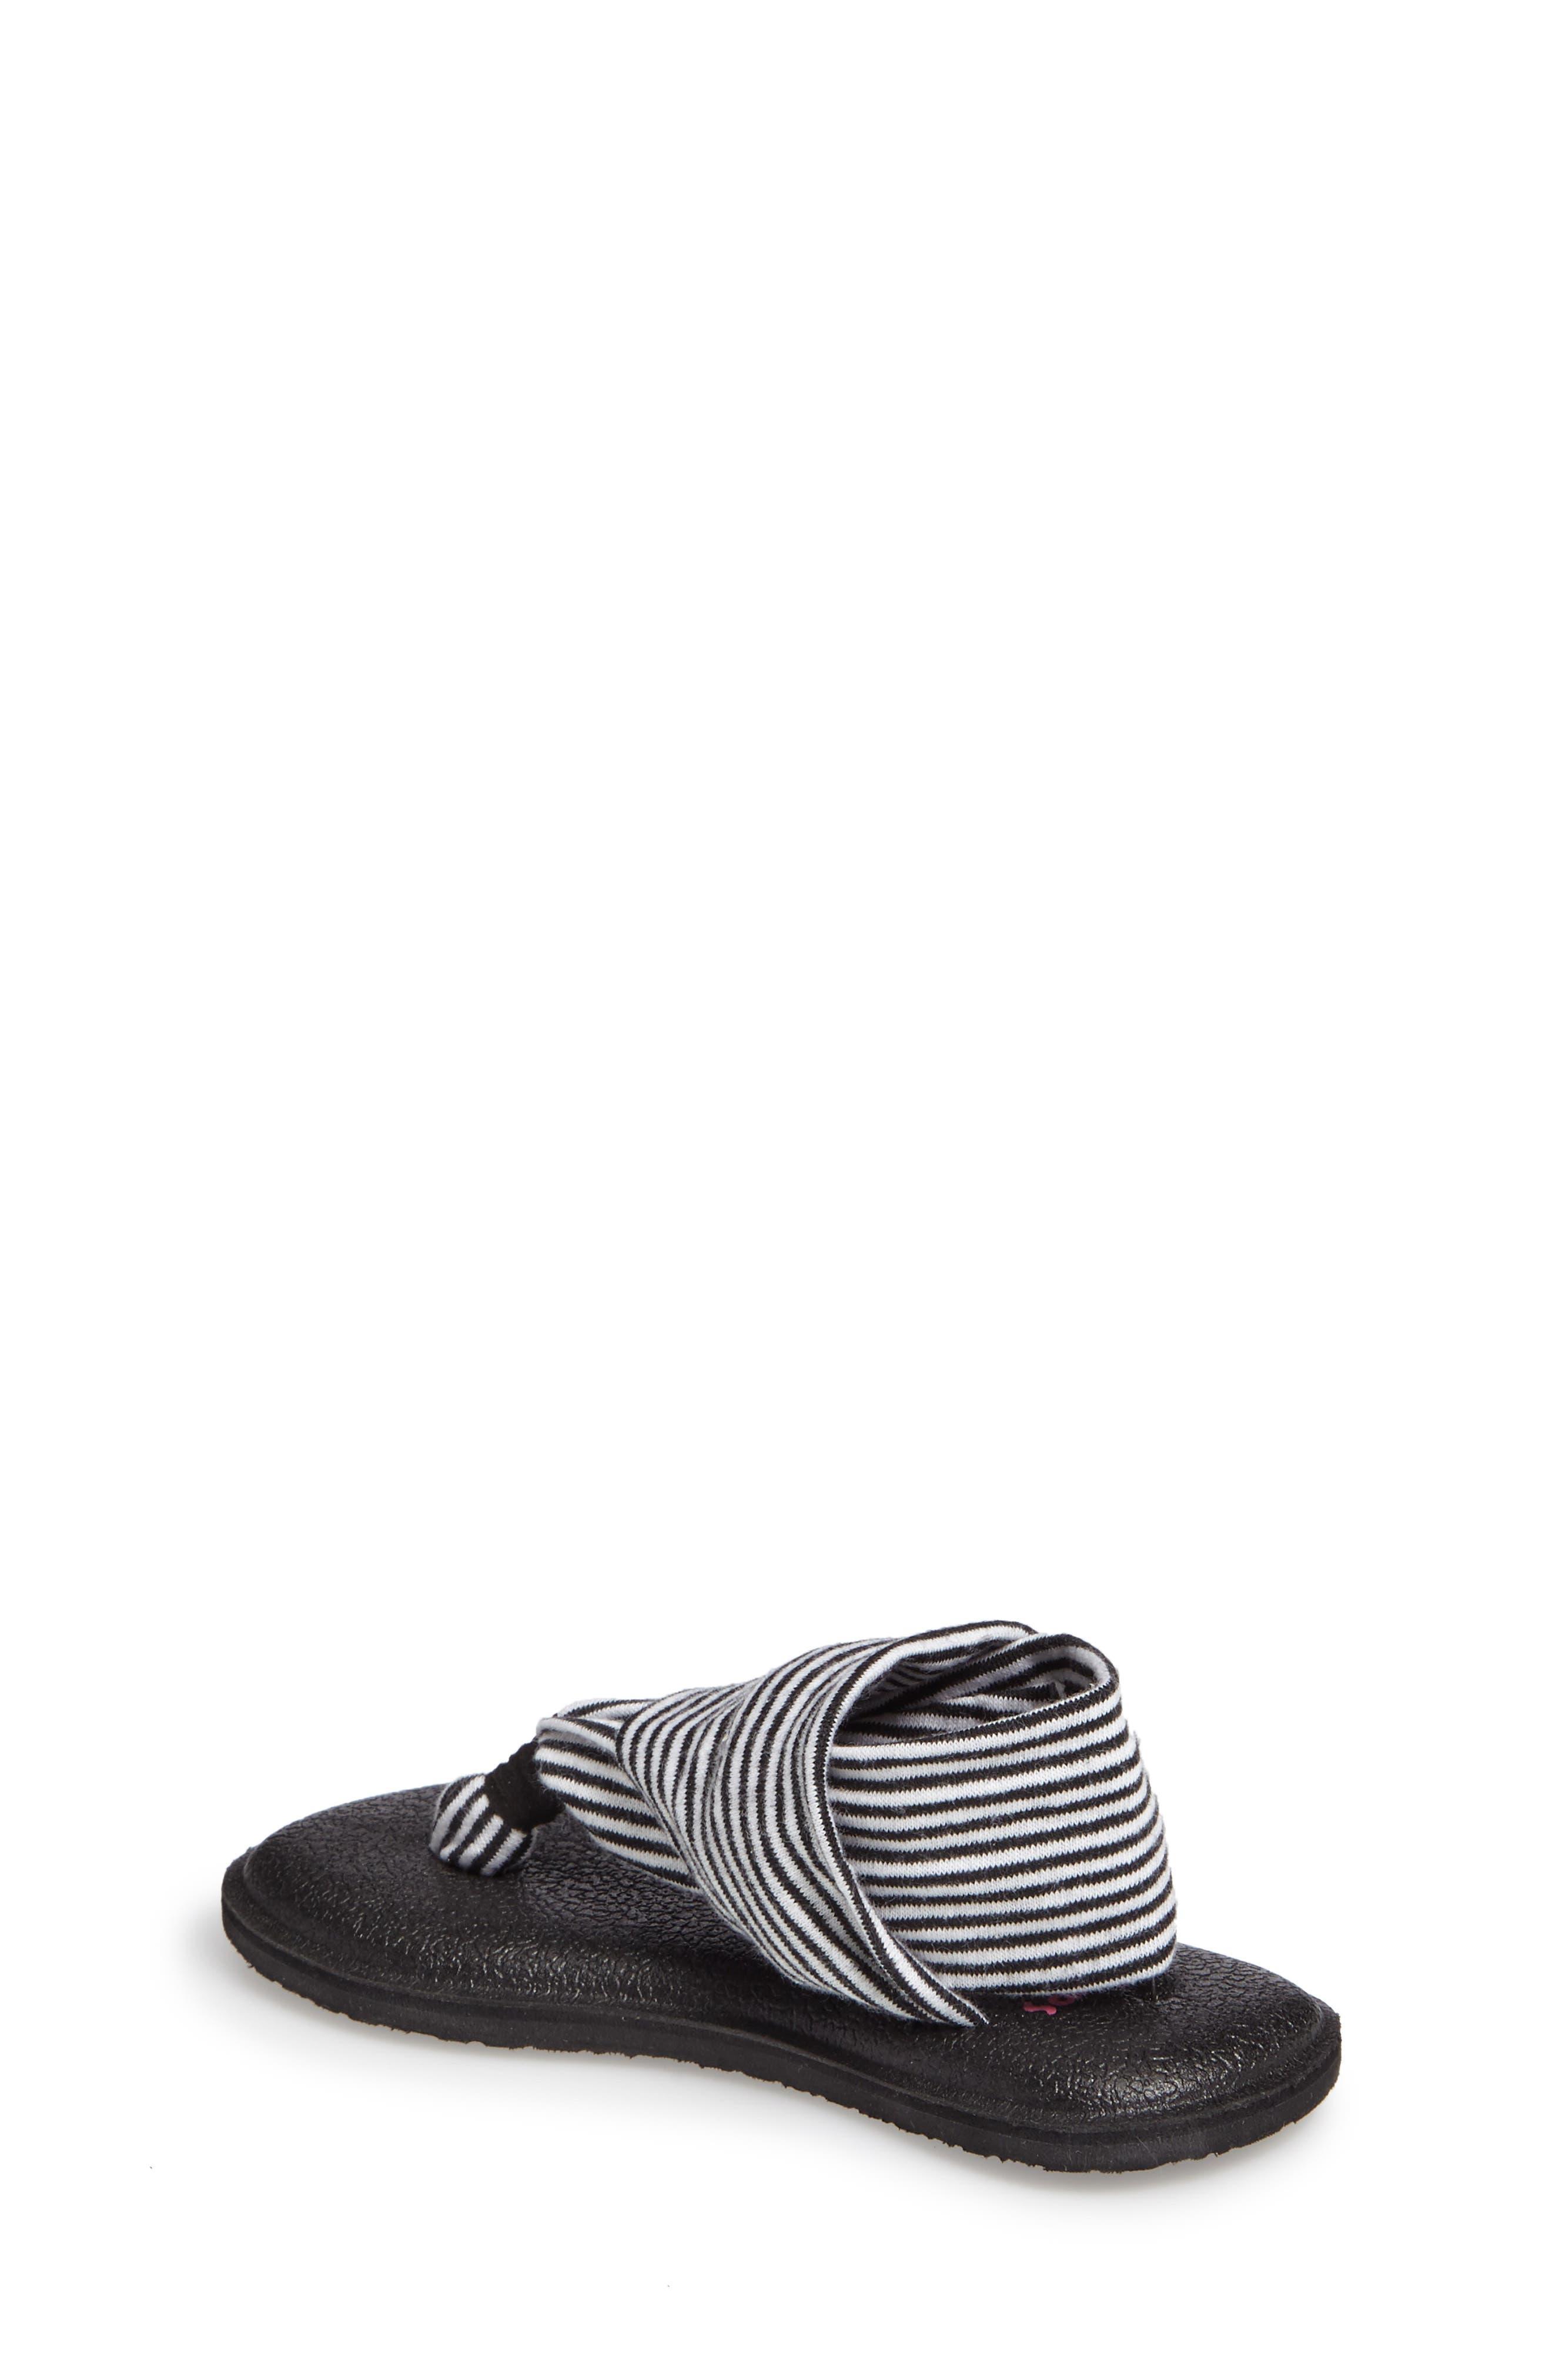 'Yoga Sling' Sandal,                             Alternate thumbnail 2, color,                             BLACK/ WHITE STRIPE